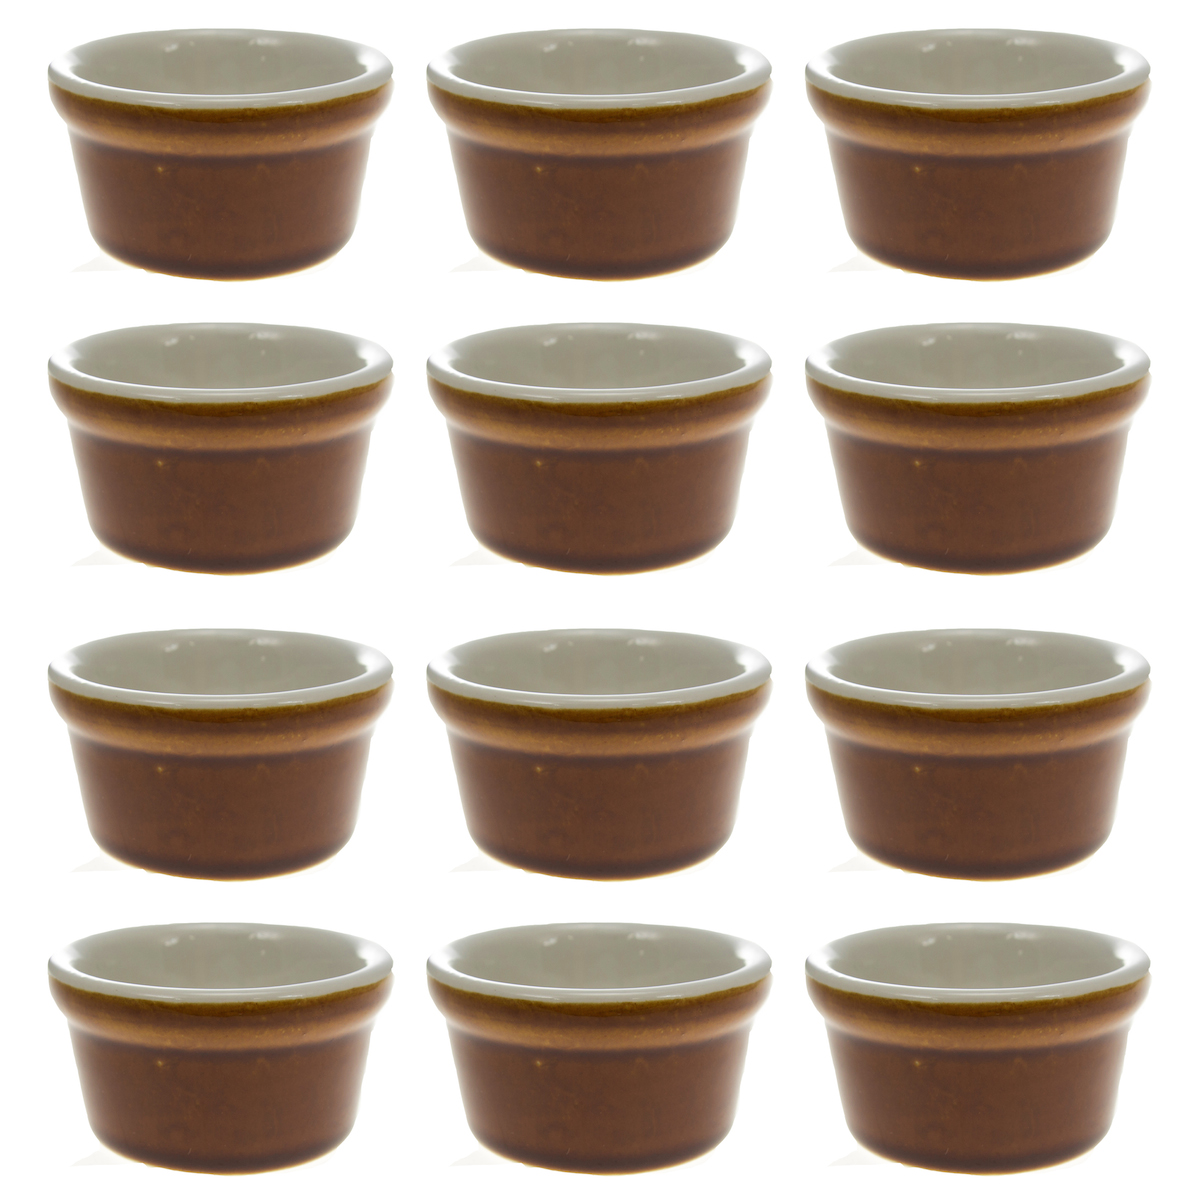 12 World Tableware Libbey Ultima 2.5oz Ramekins Dessert Sauce Caramel Colored by Libbey